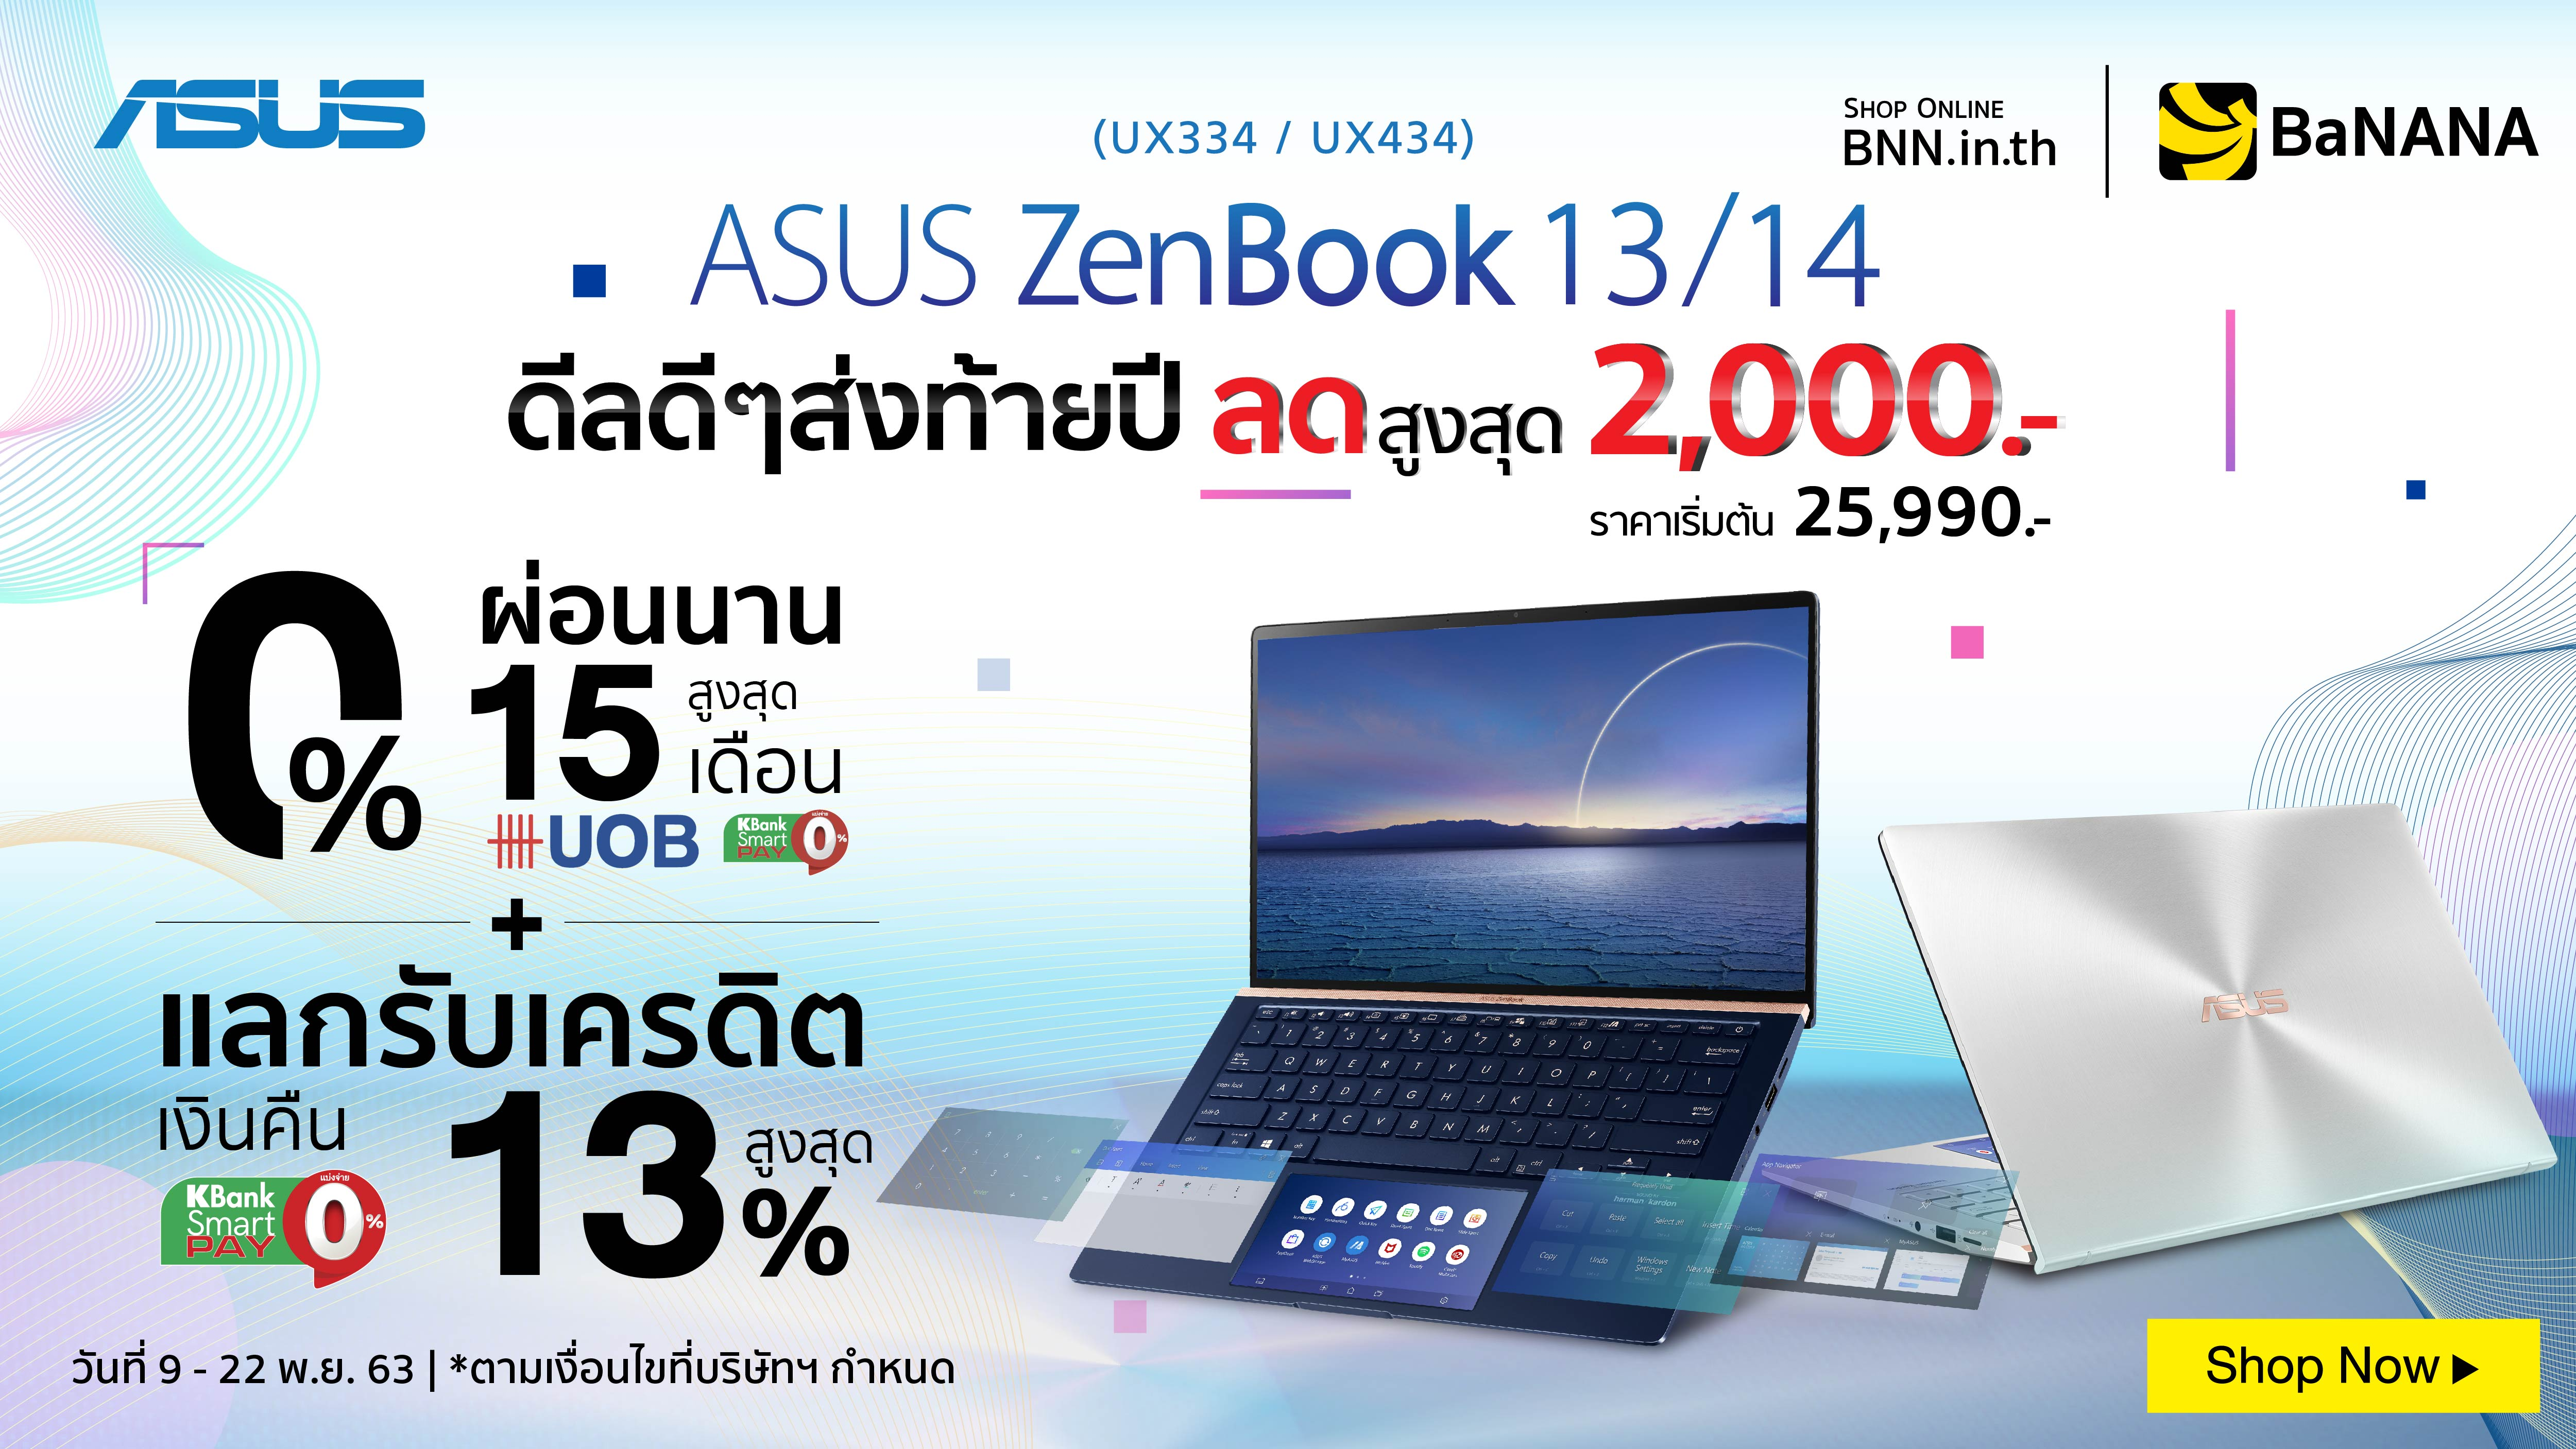 bnn.in.th - Asus Zenbook_9-22 Nov 20